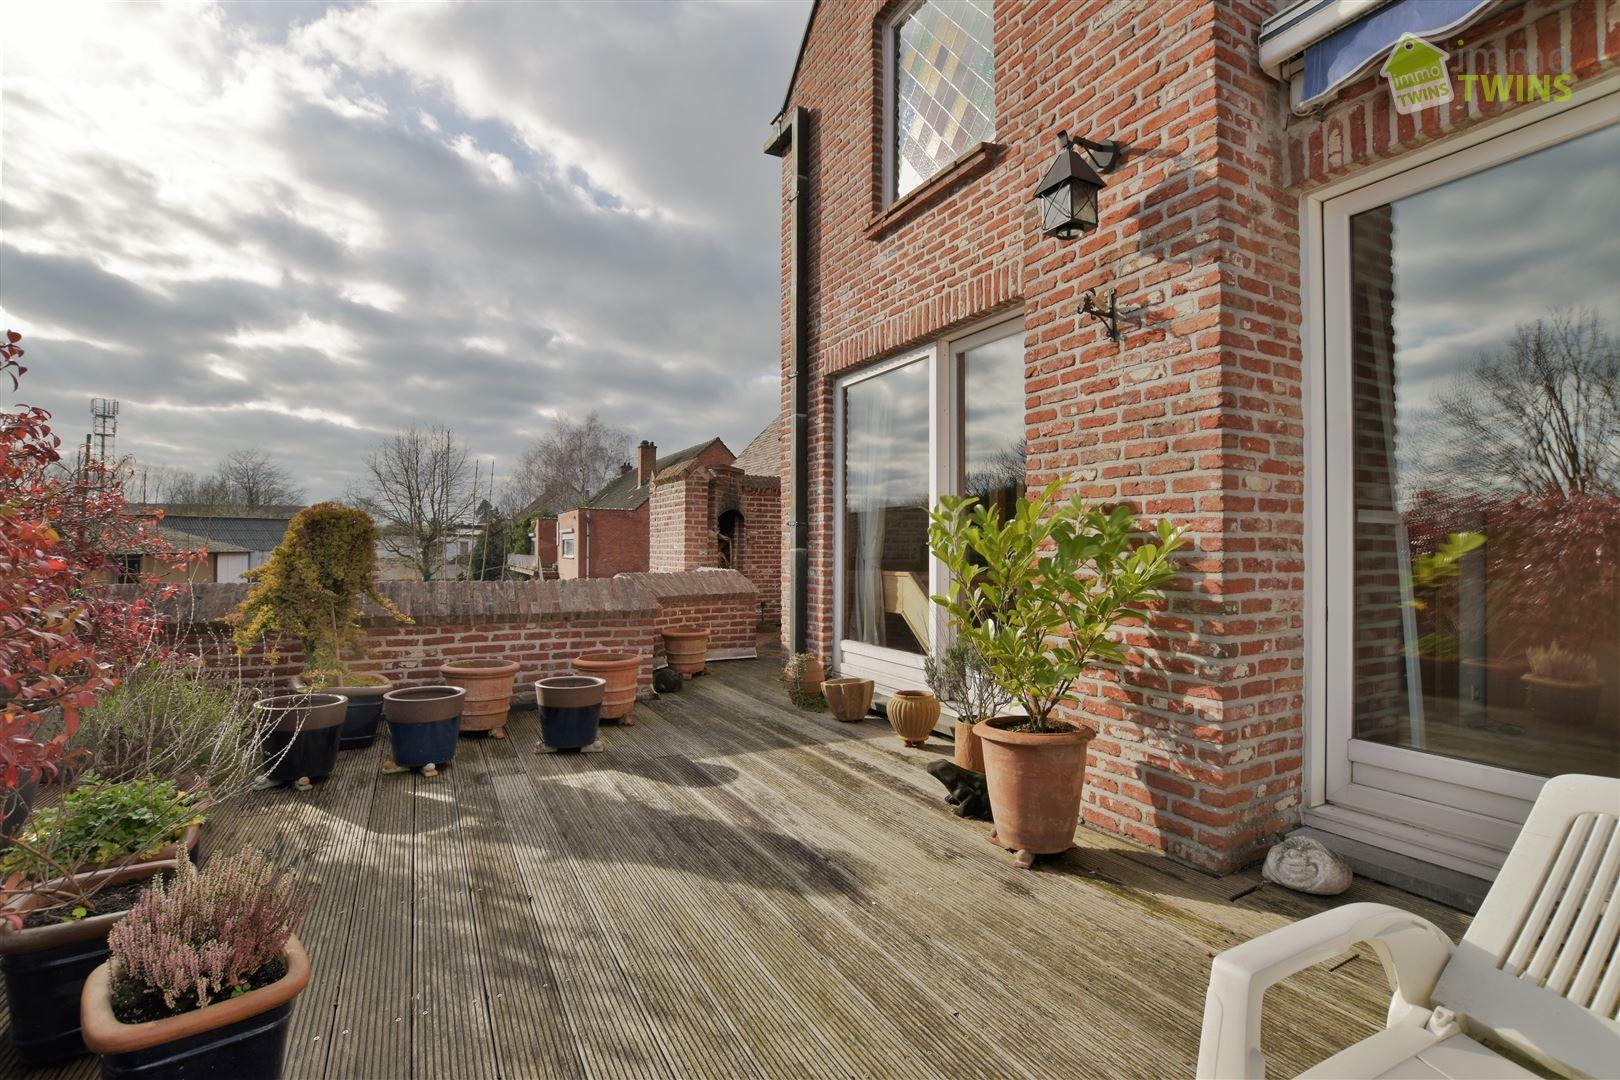 Foto 16 : Duplex/triplex te 9200 Dendermonde (België) - Prijs € 398.000